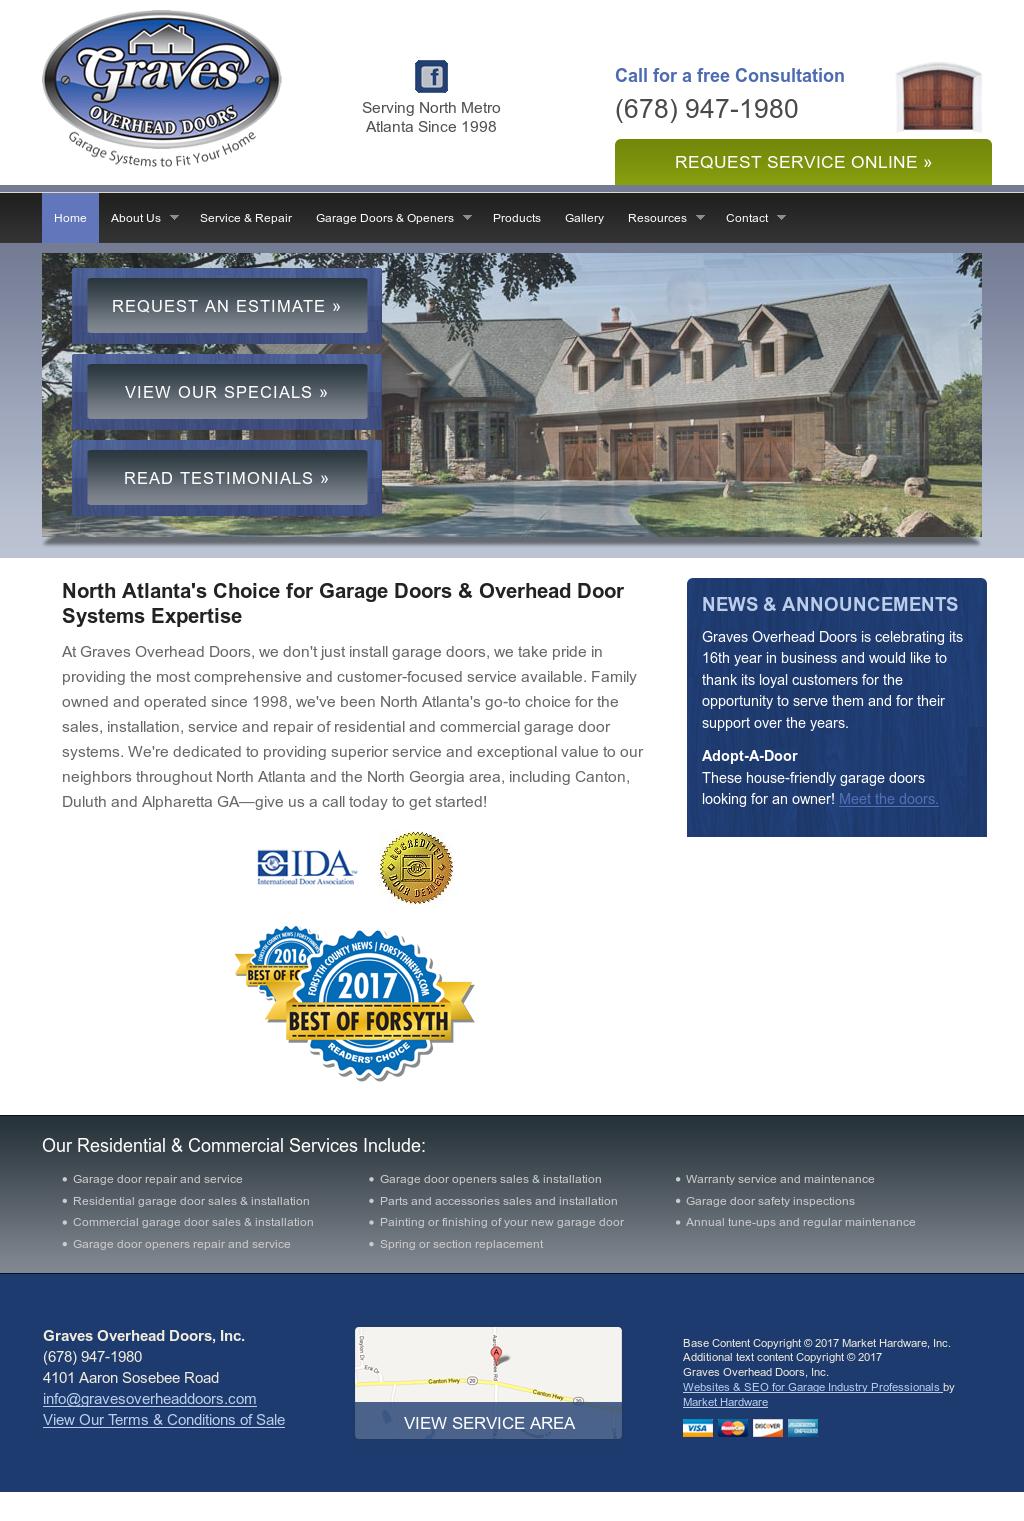 ga graves recently atlanta brookwood garage doors sold p trulia pl